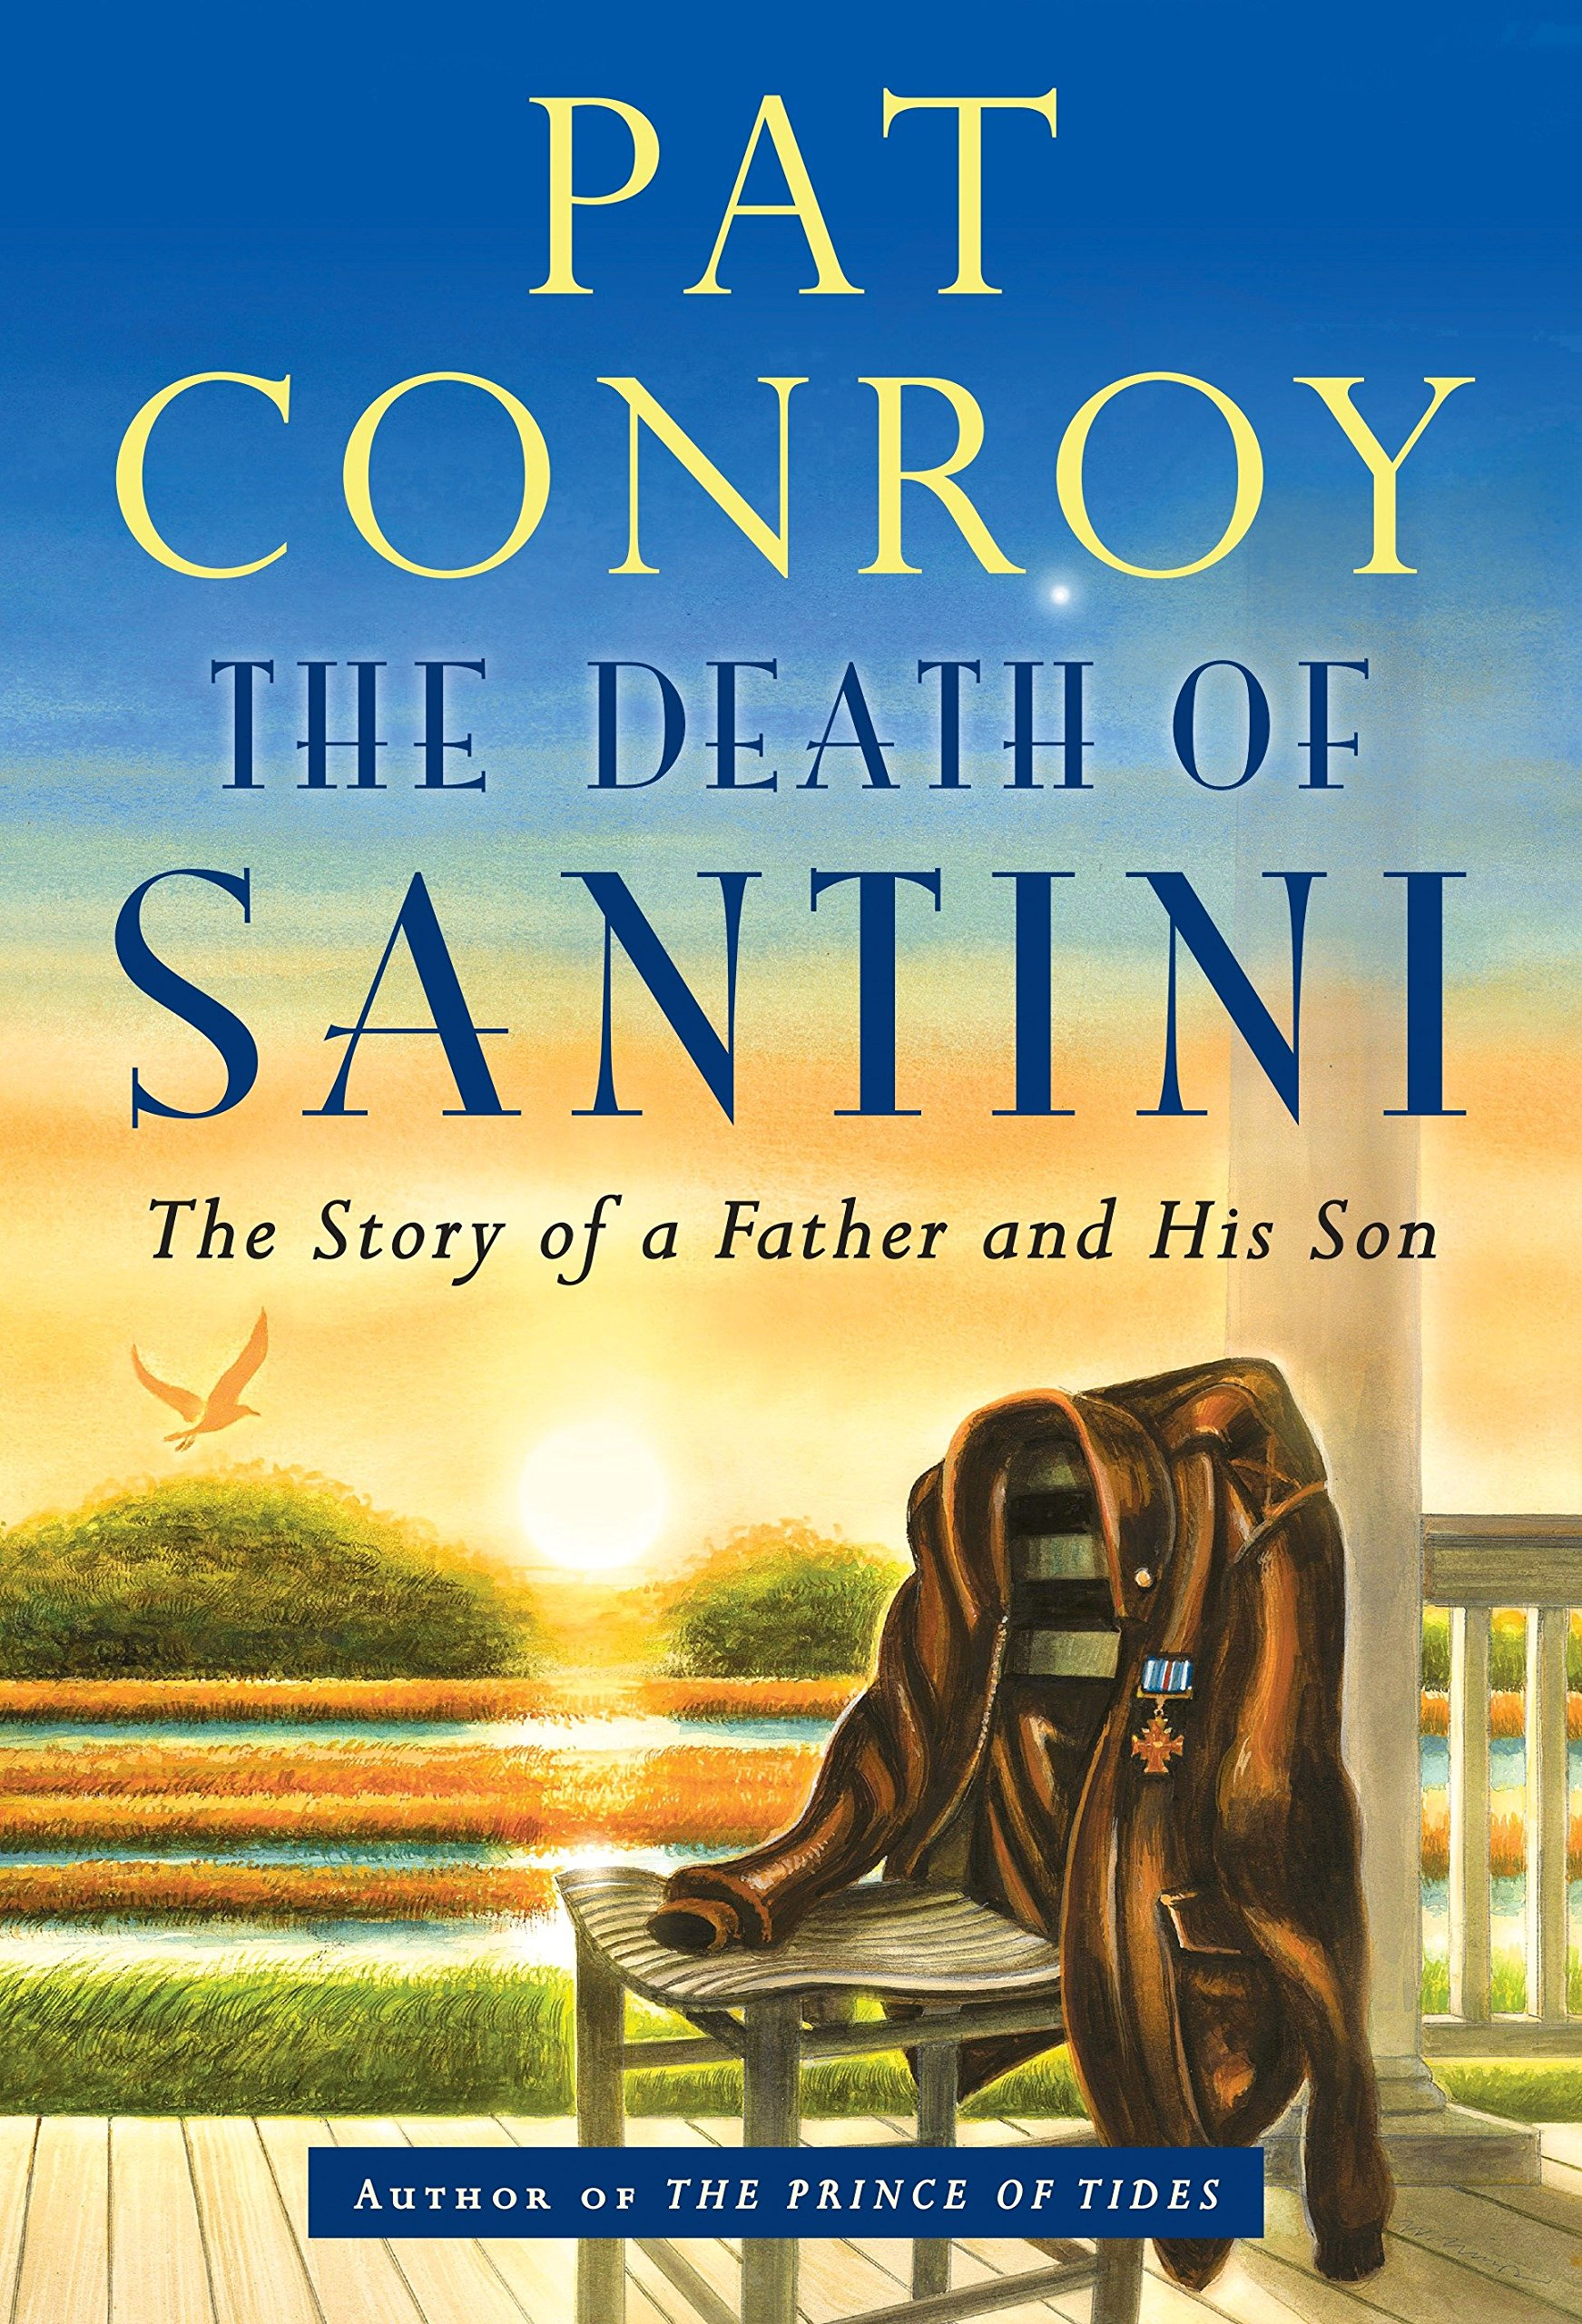 Death-of-Santini_Conroy.jpg